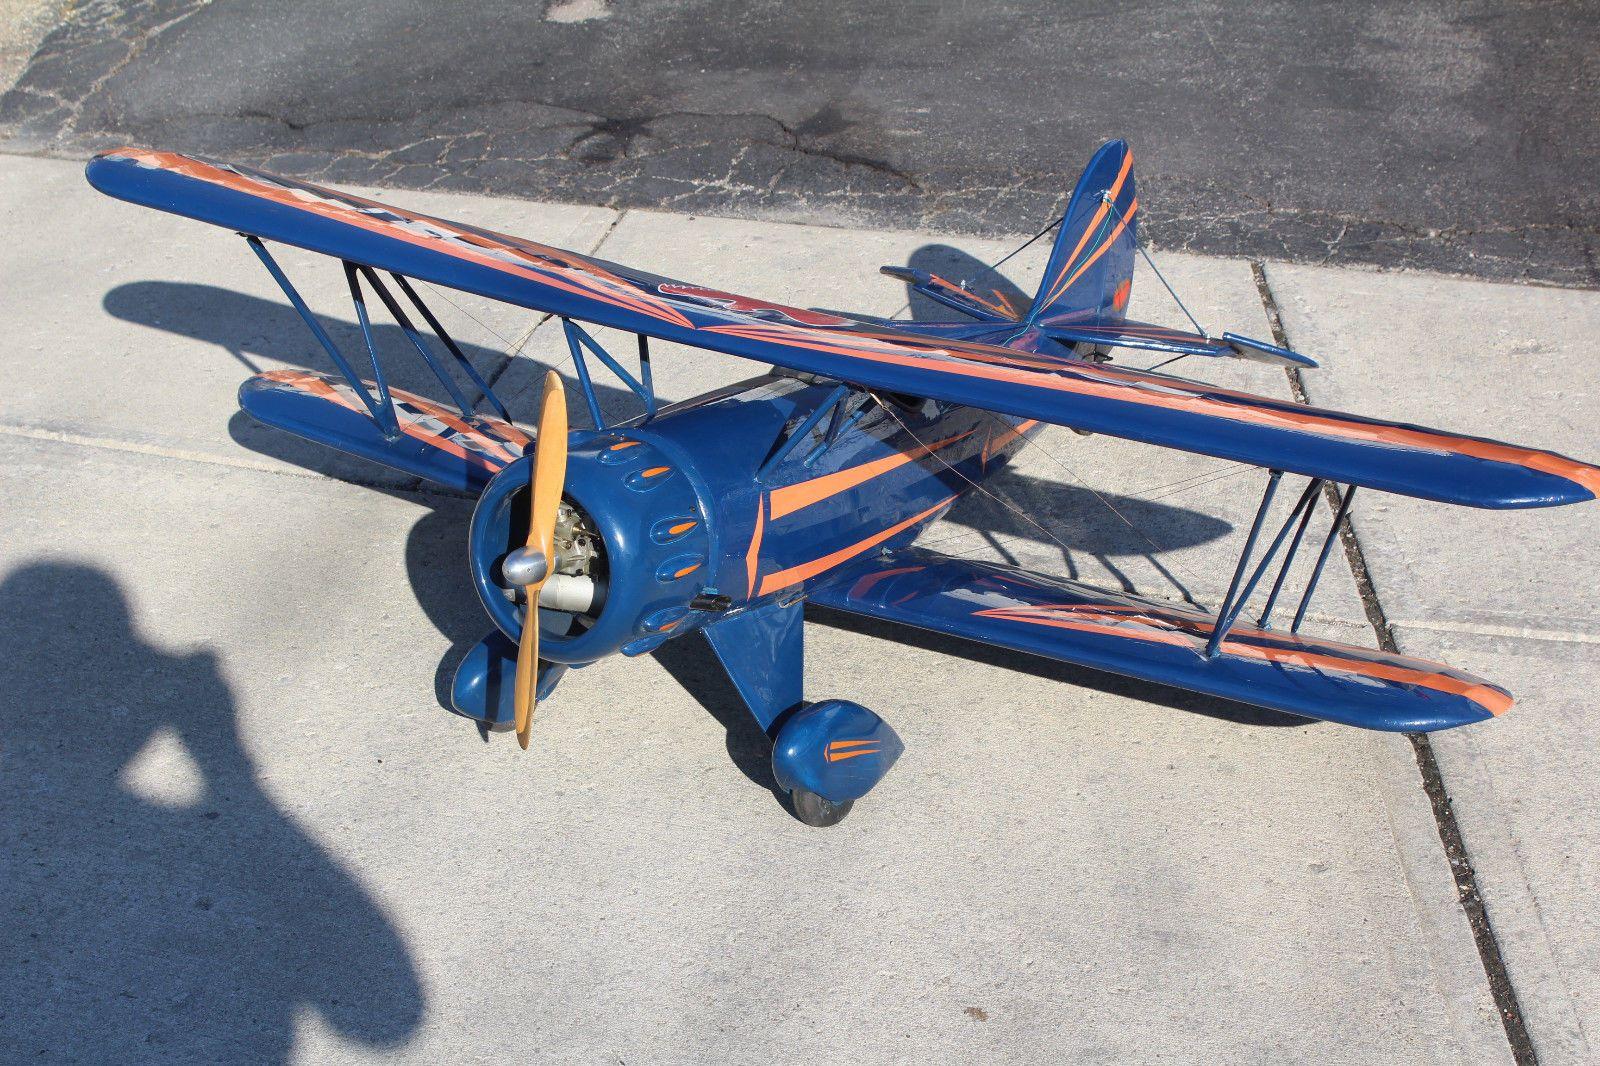 Waco F Series Biplane Gas Powered   eBay   RC Aircraft   Rc